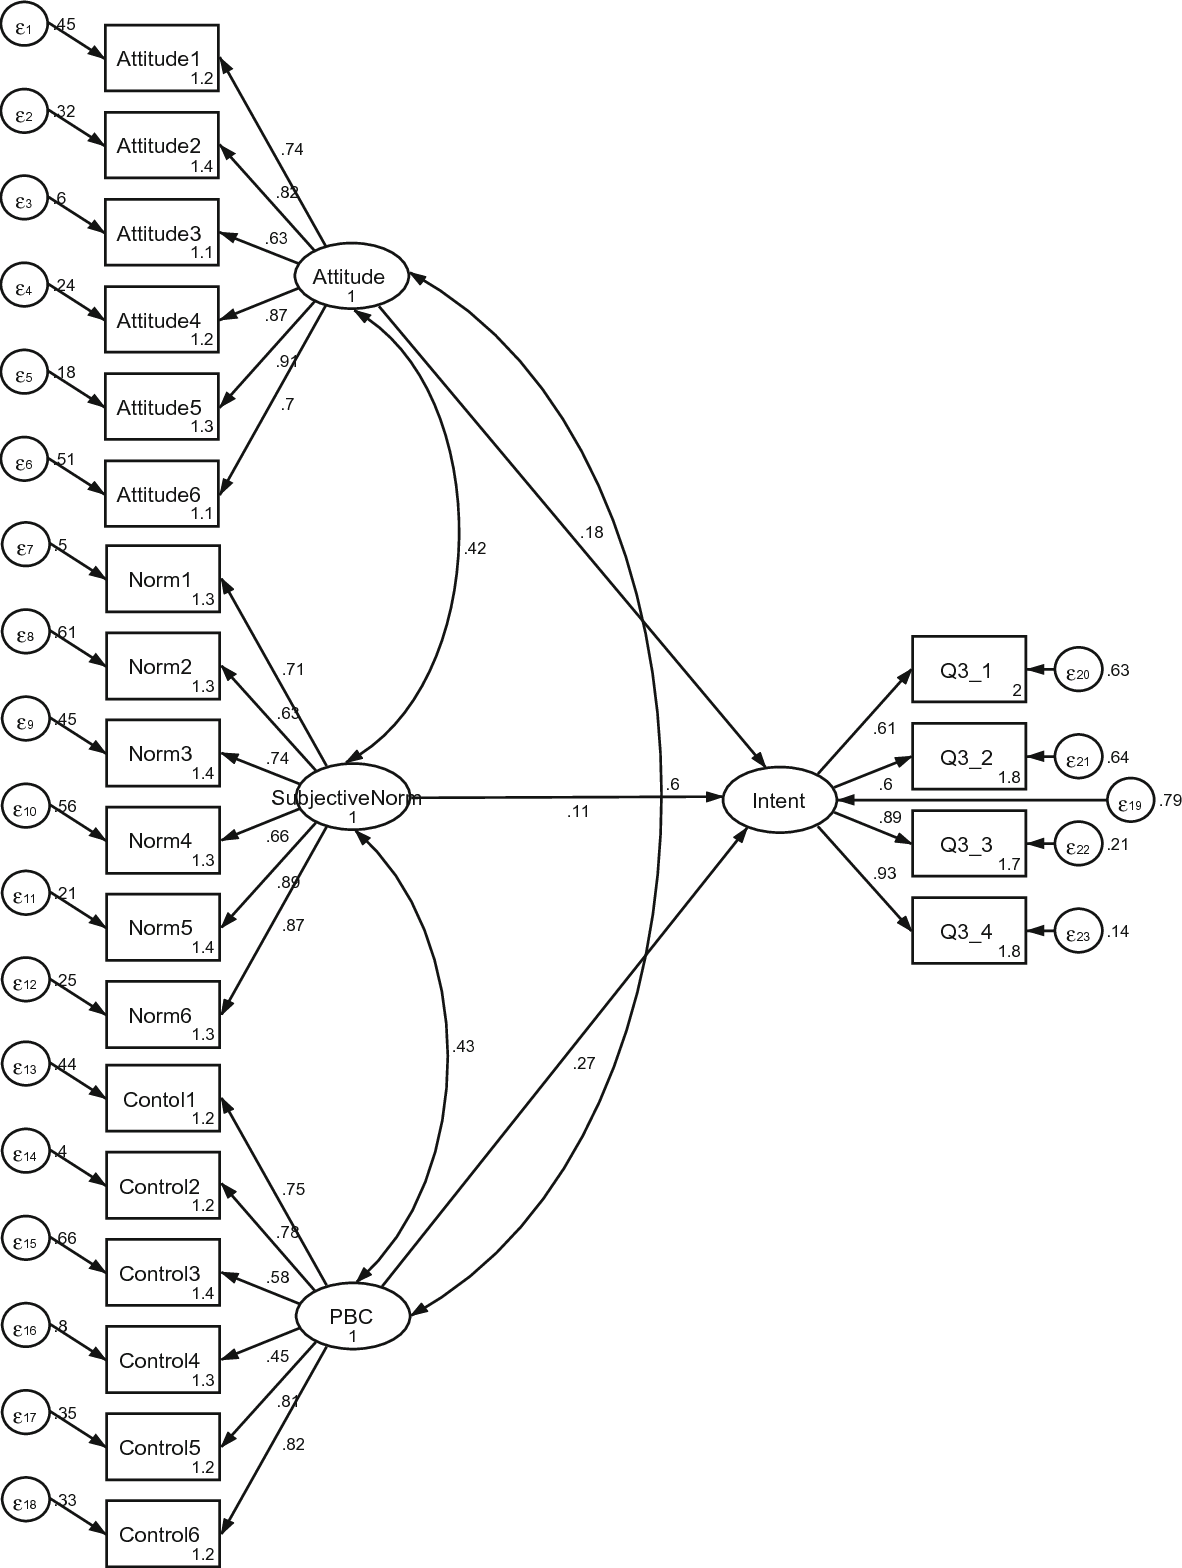 Fig. 2 Full SEM model using the TPB regarding women's participation in a conservation program in western Belize, 2015 (n = 486)